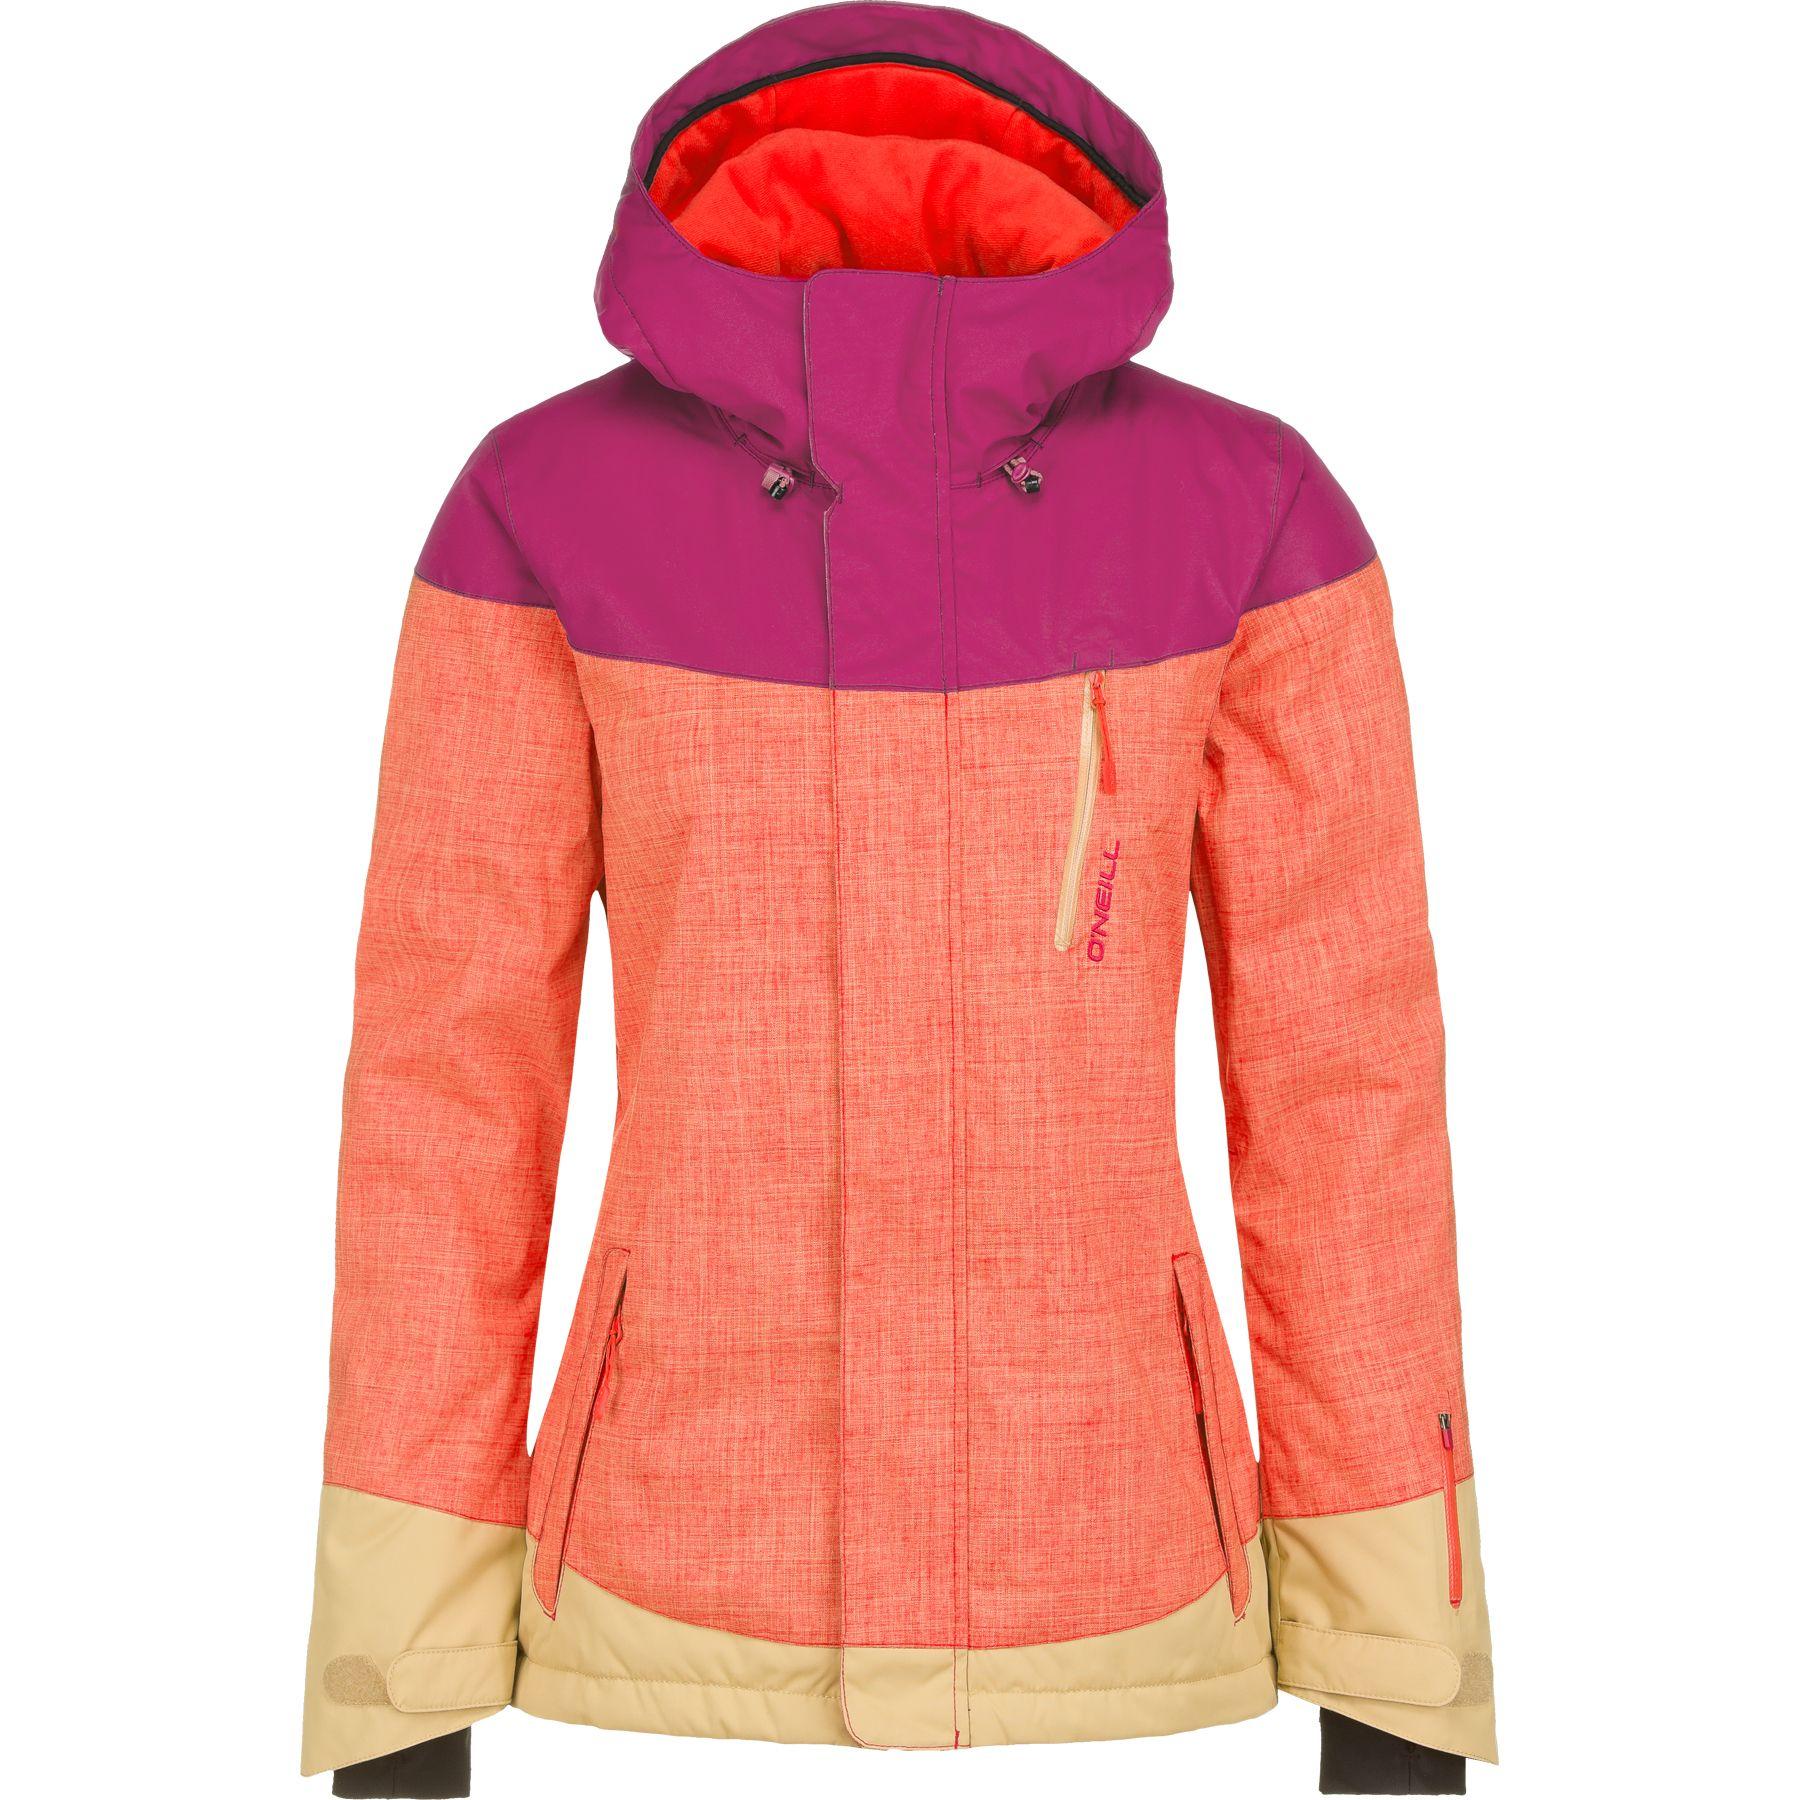 Coral jacket | Snowboardjacke